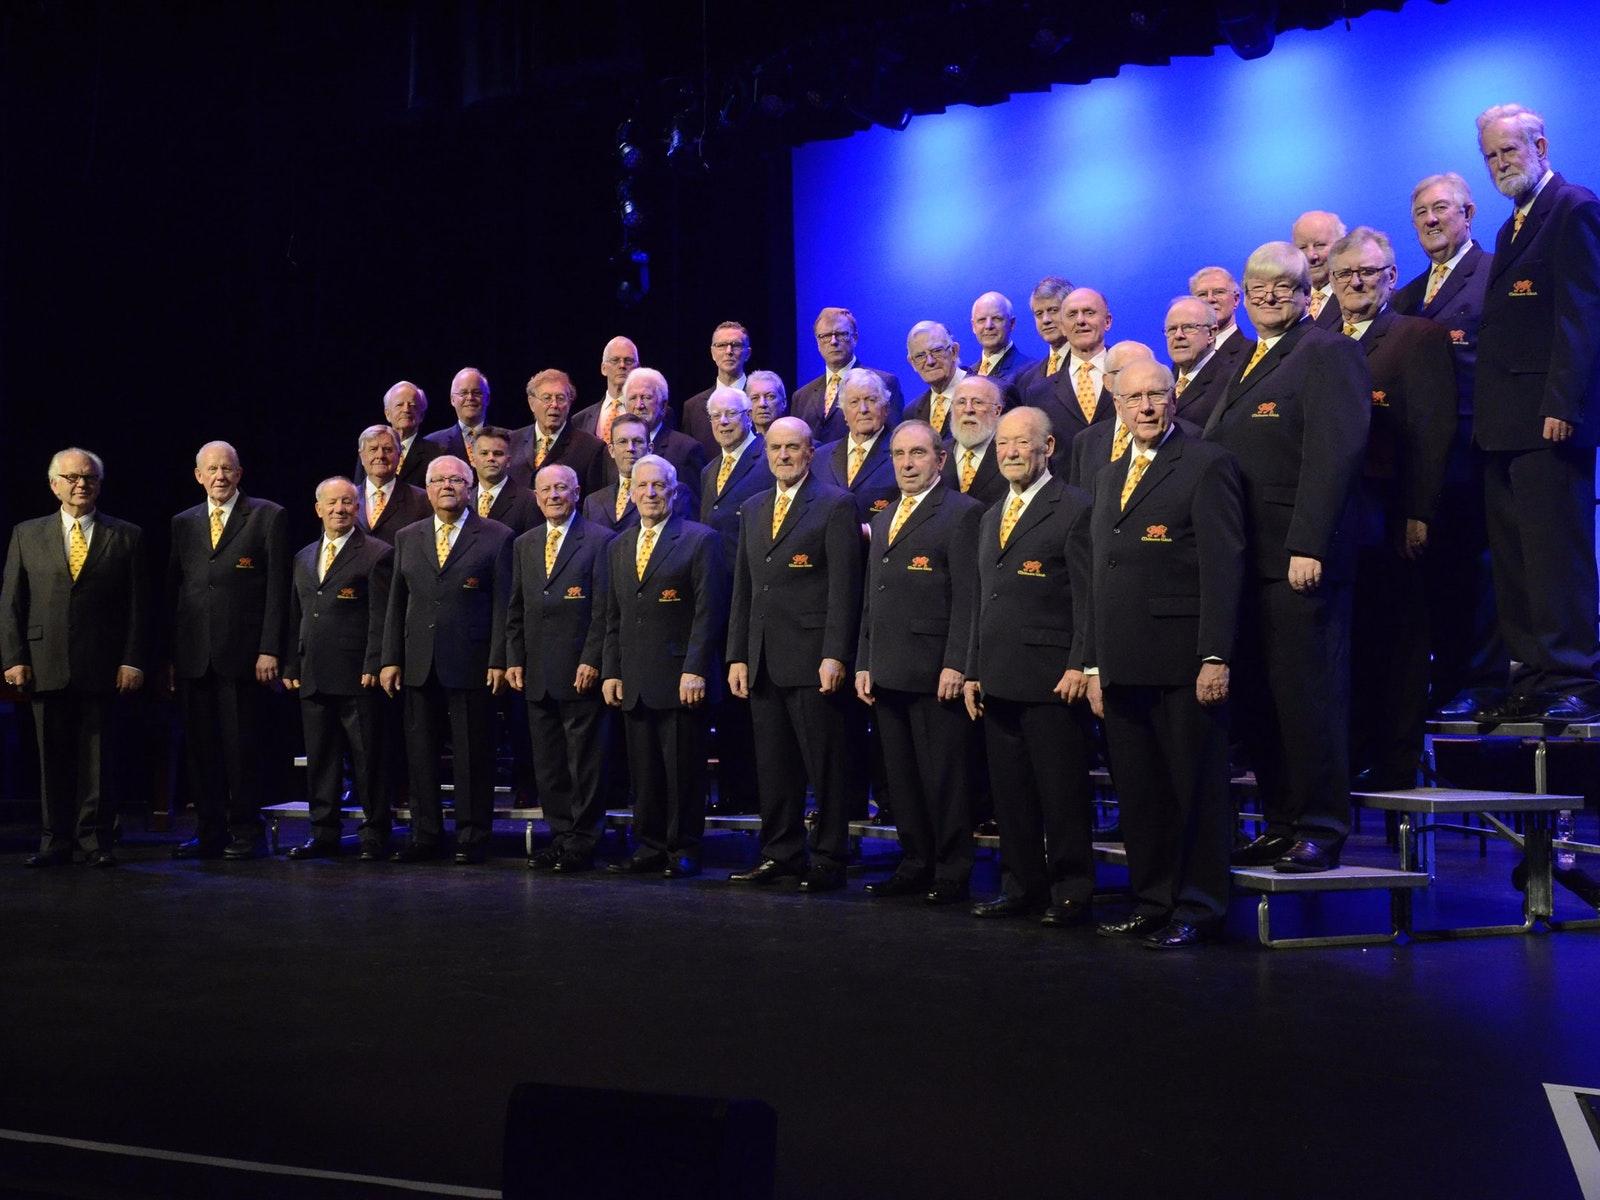 Melbourne Male Welsh Choir